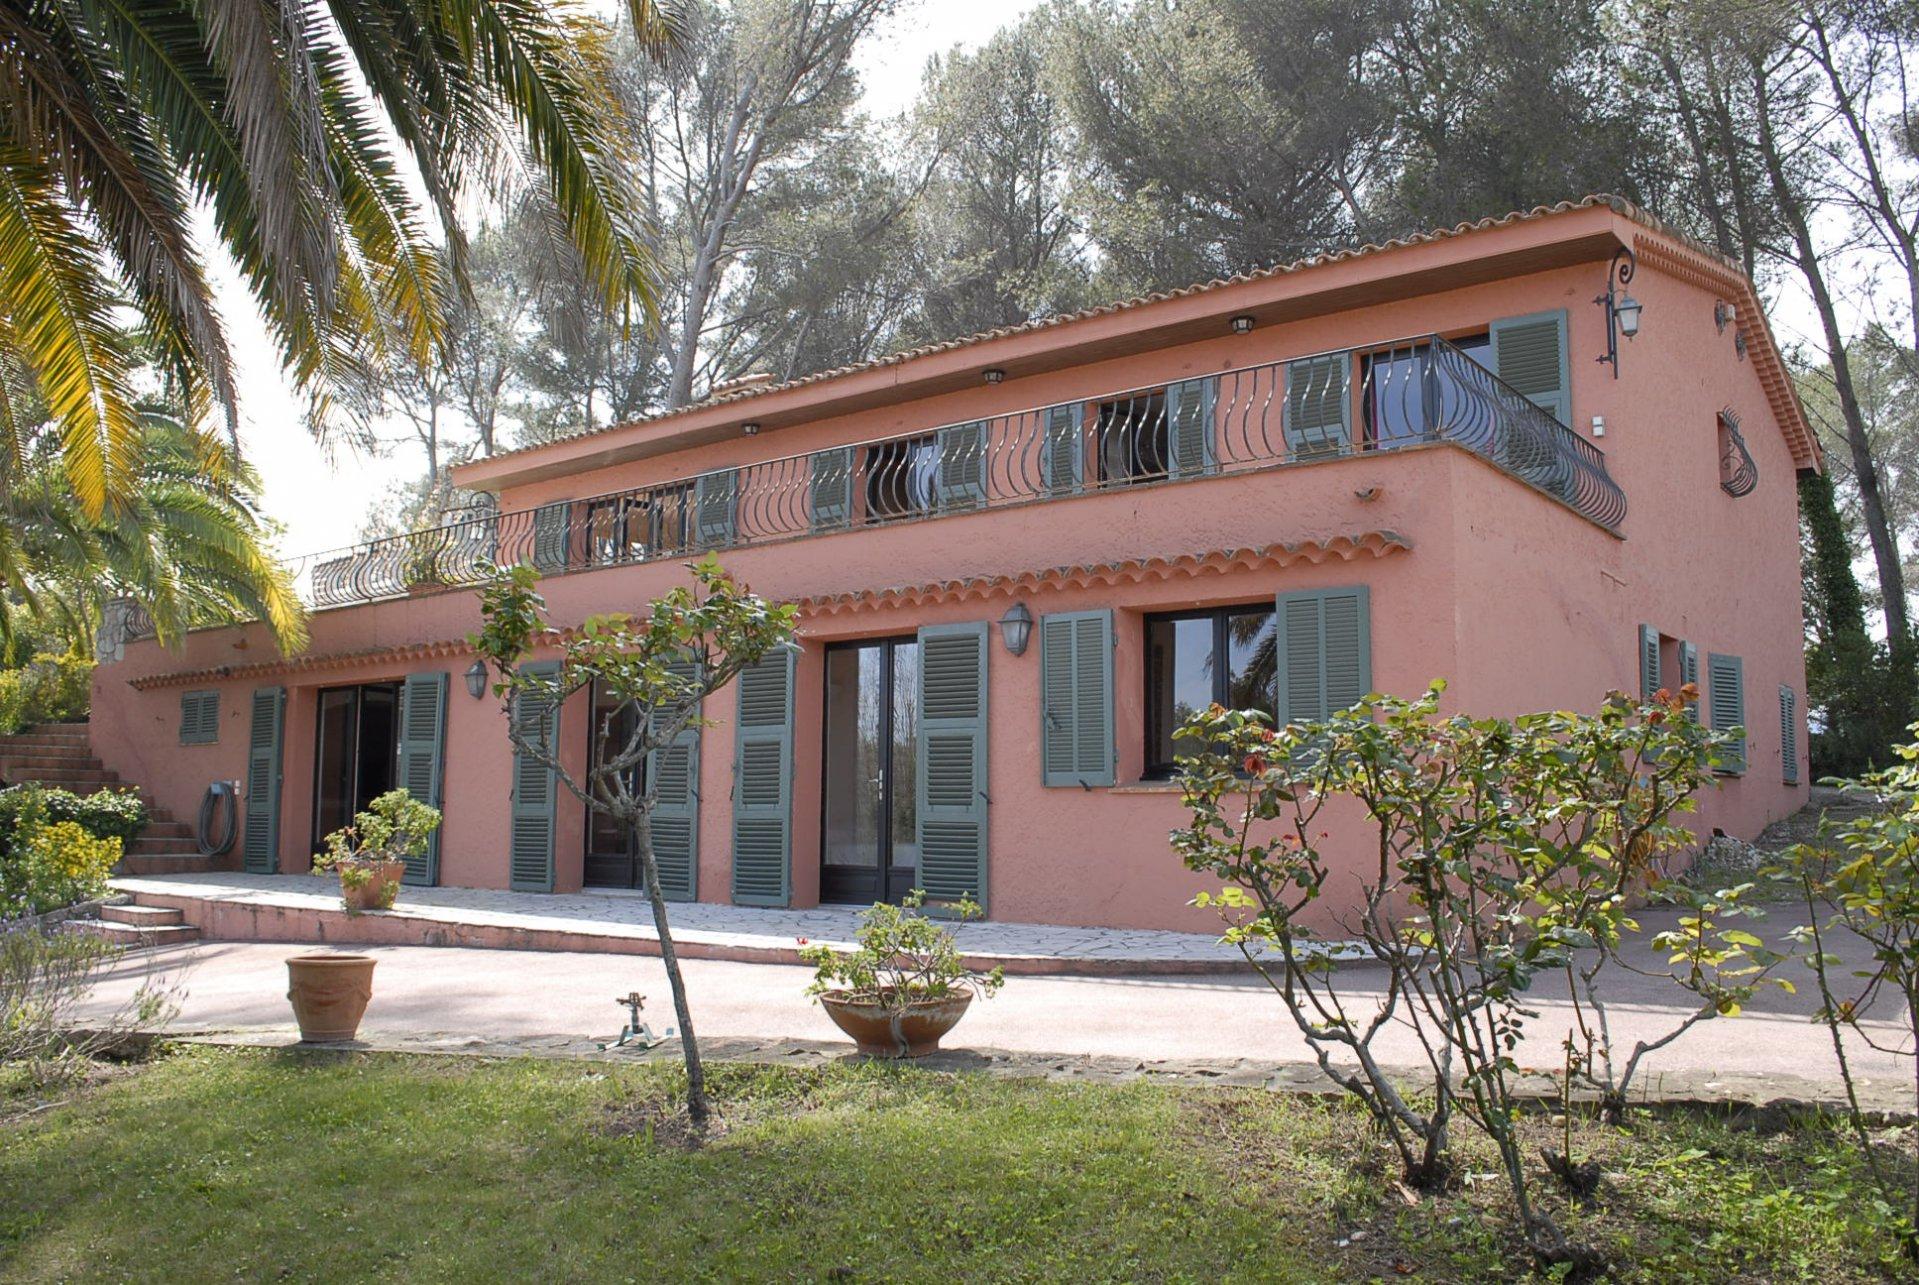 Mandelieu villa 10 rooms on 2 floors